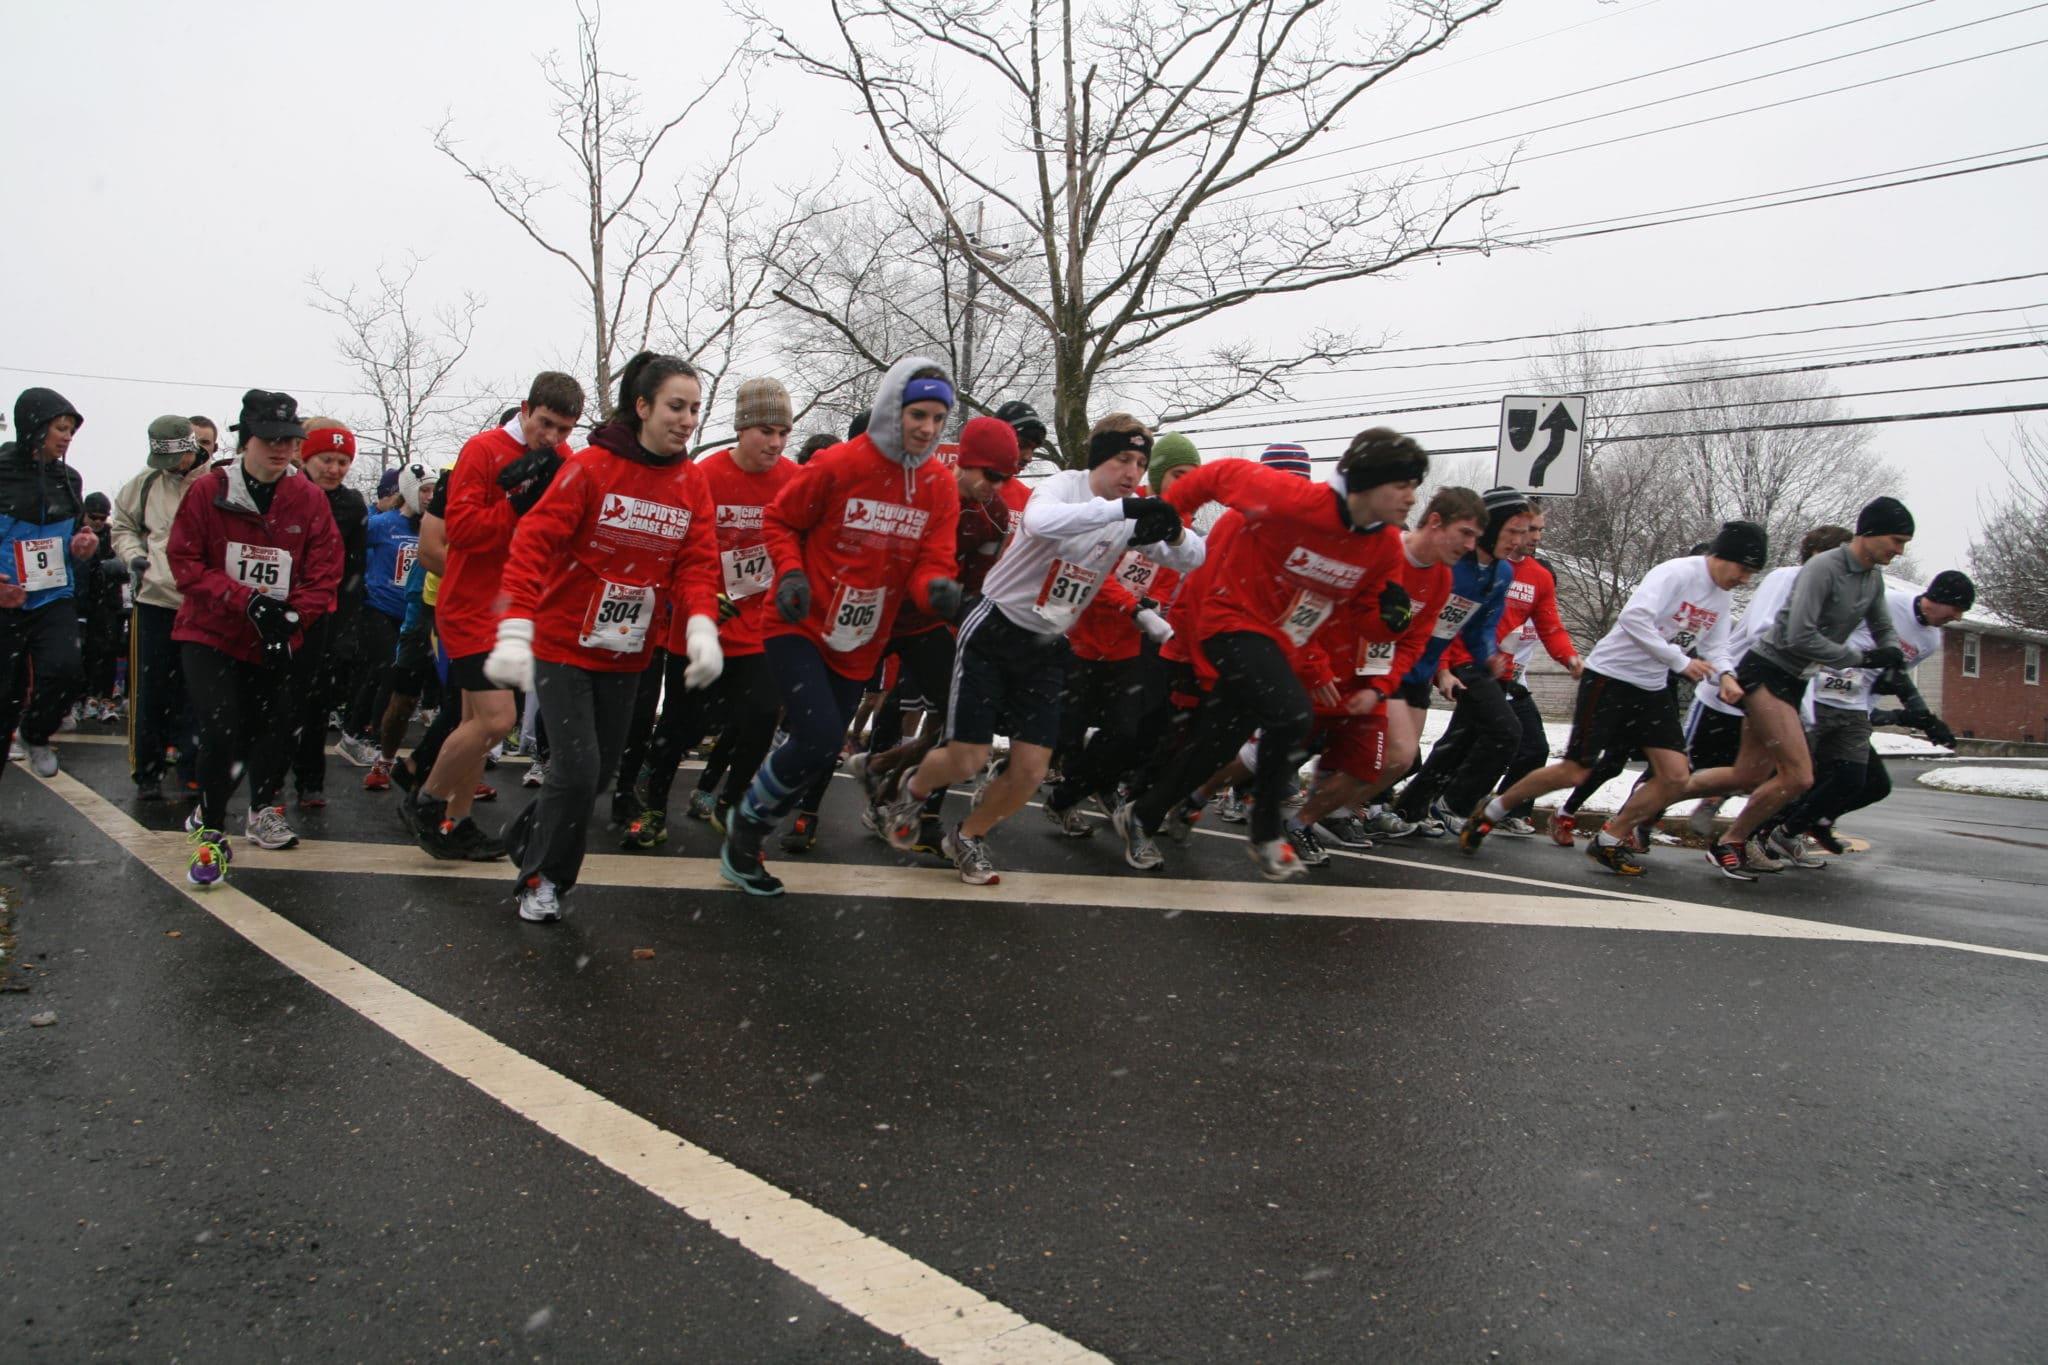 Start of the the Princeton, NJ run.